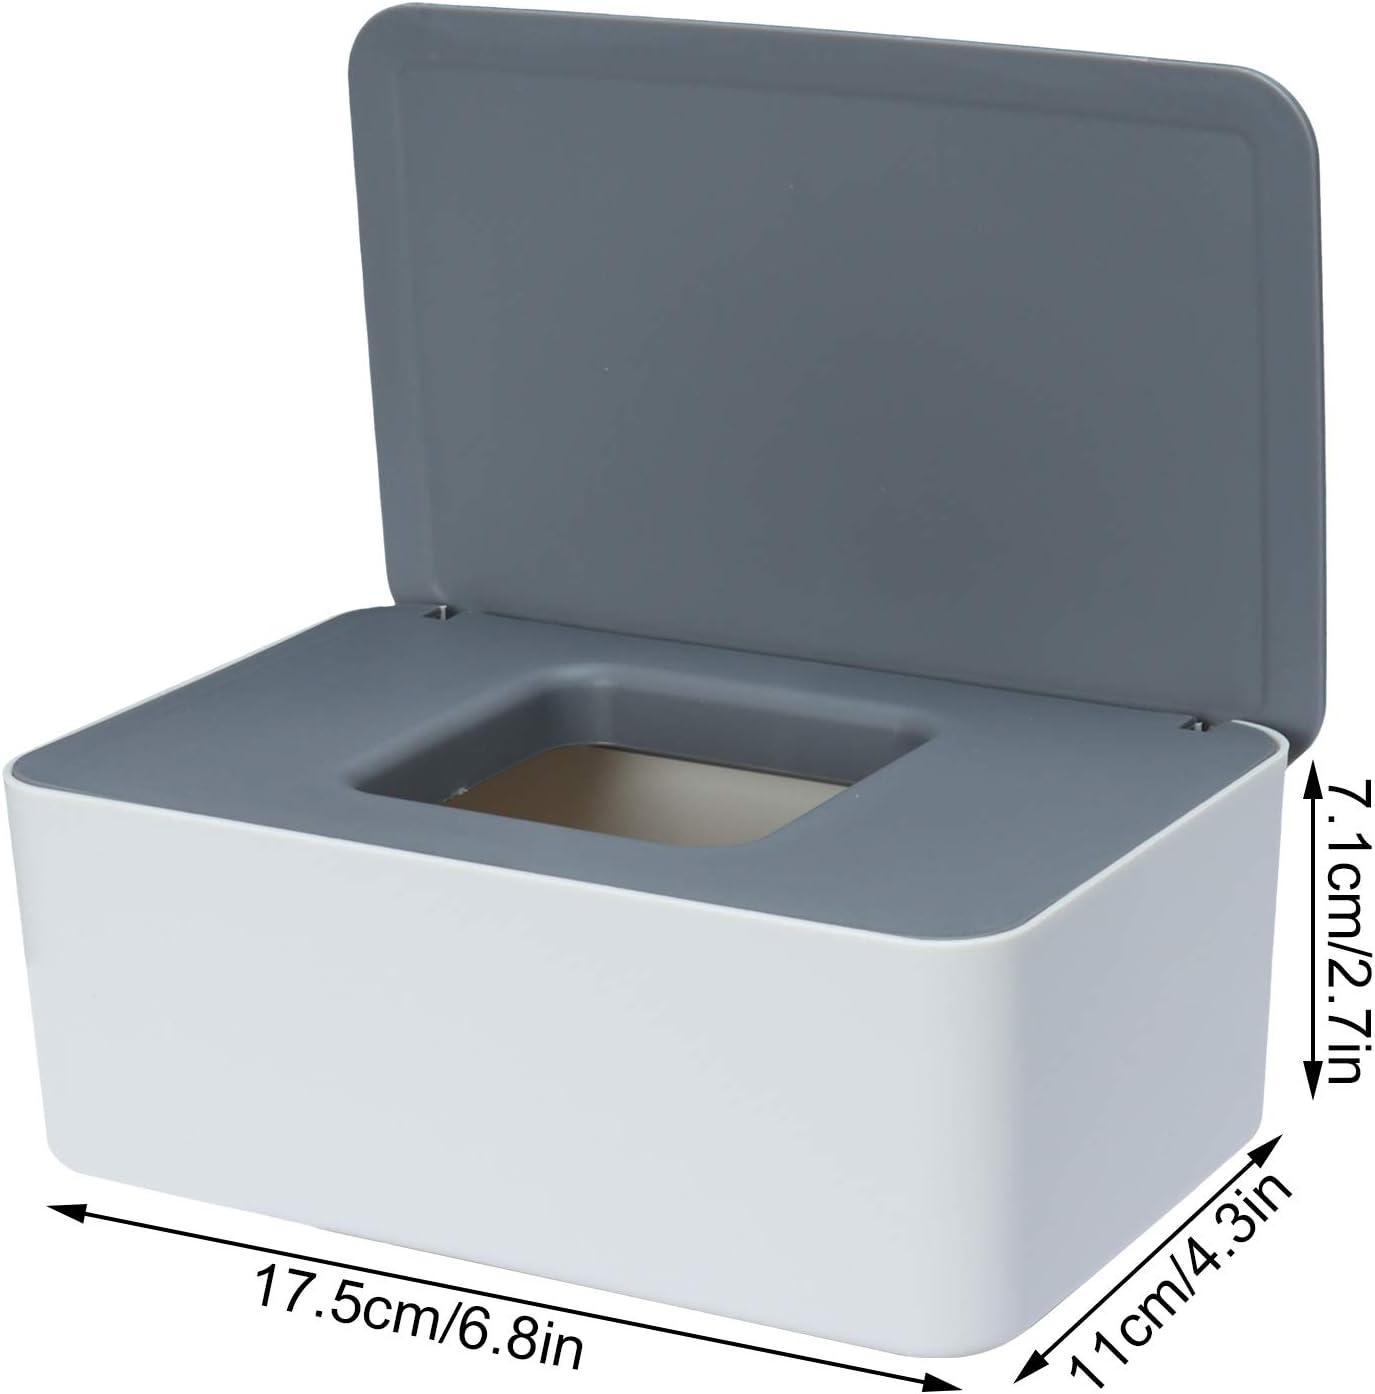 Sinwind Caja para Toallitas H/úmedas Toallitas Dispensador Caja de Pa/ñuelos Caja De Servilletas Caja de Almacenamiento de Pa/ñuelos con Tapa Azul-Blanco